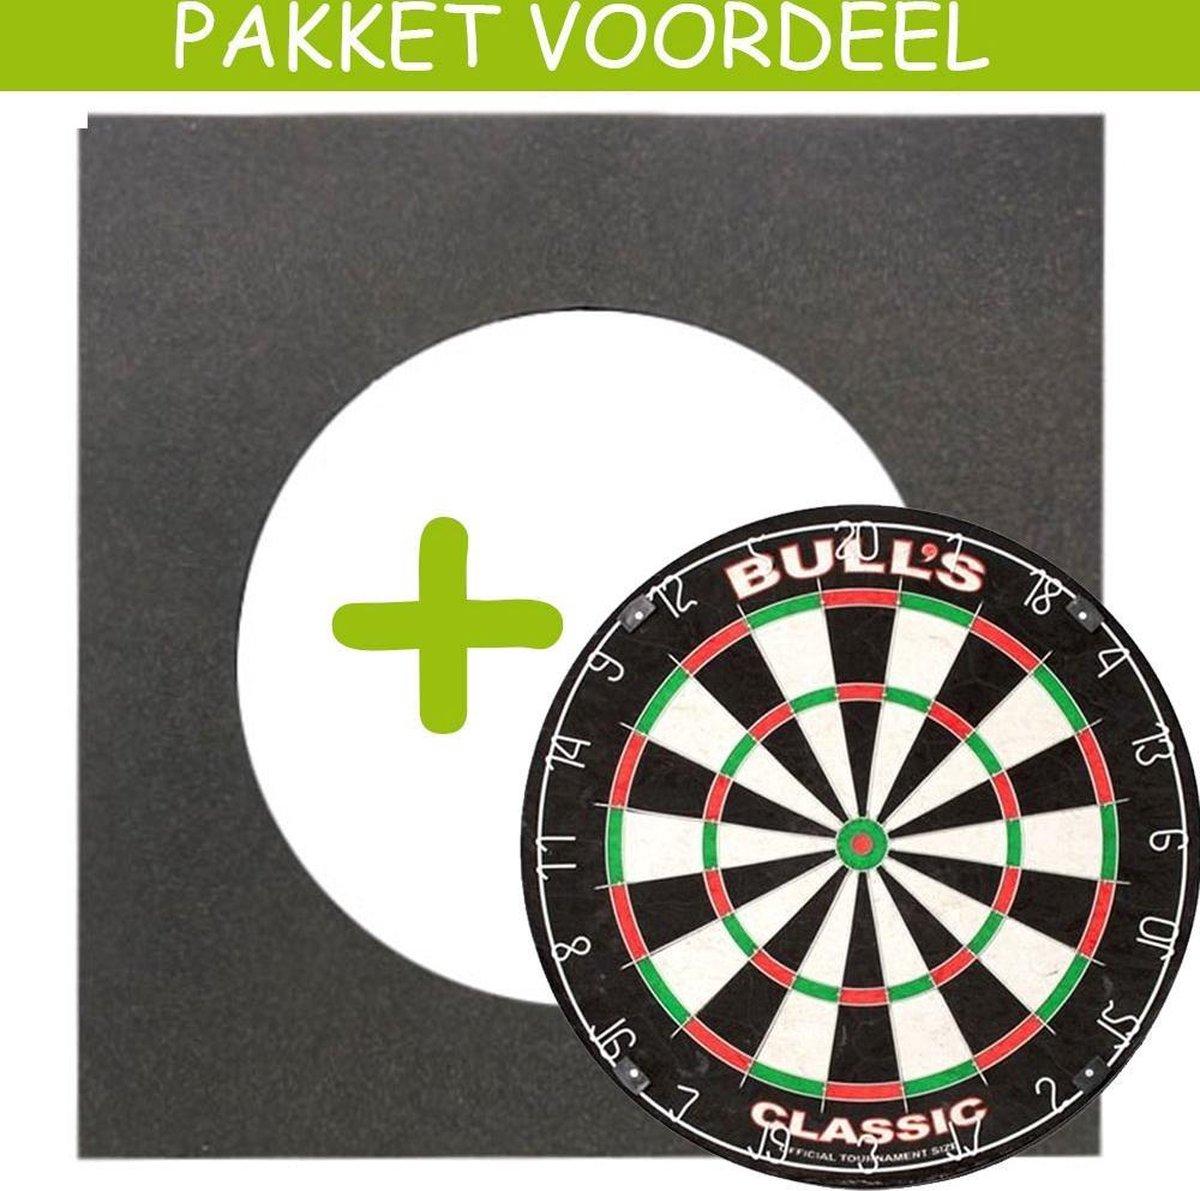 Dartbord VoordeelPakket Basic - Bulls Classic - Vierkant-